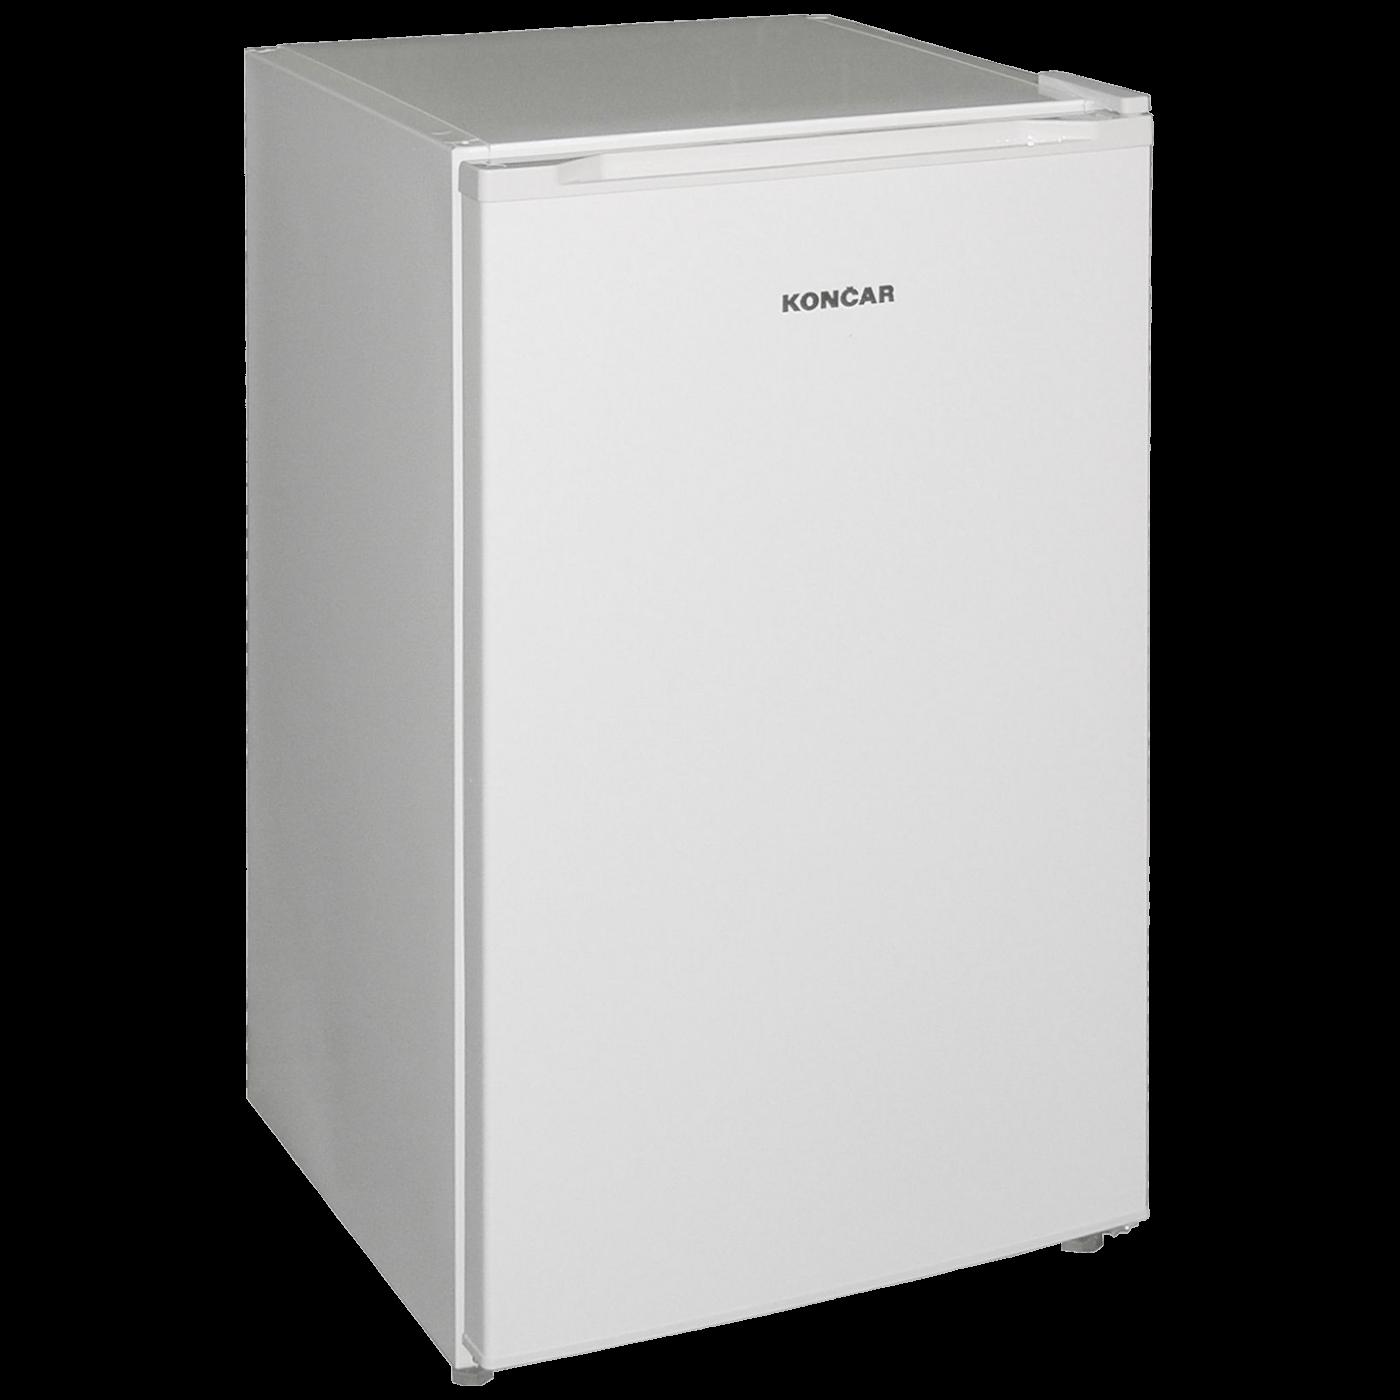 Frižider, zapremina 91 lit., A+